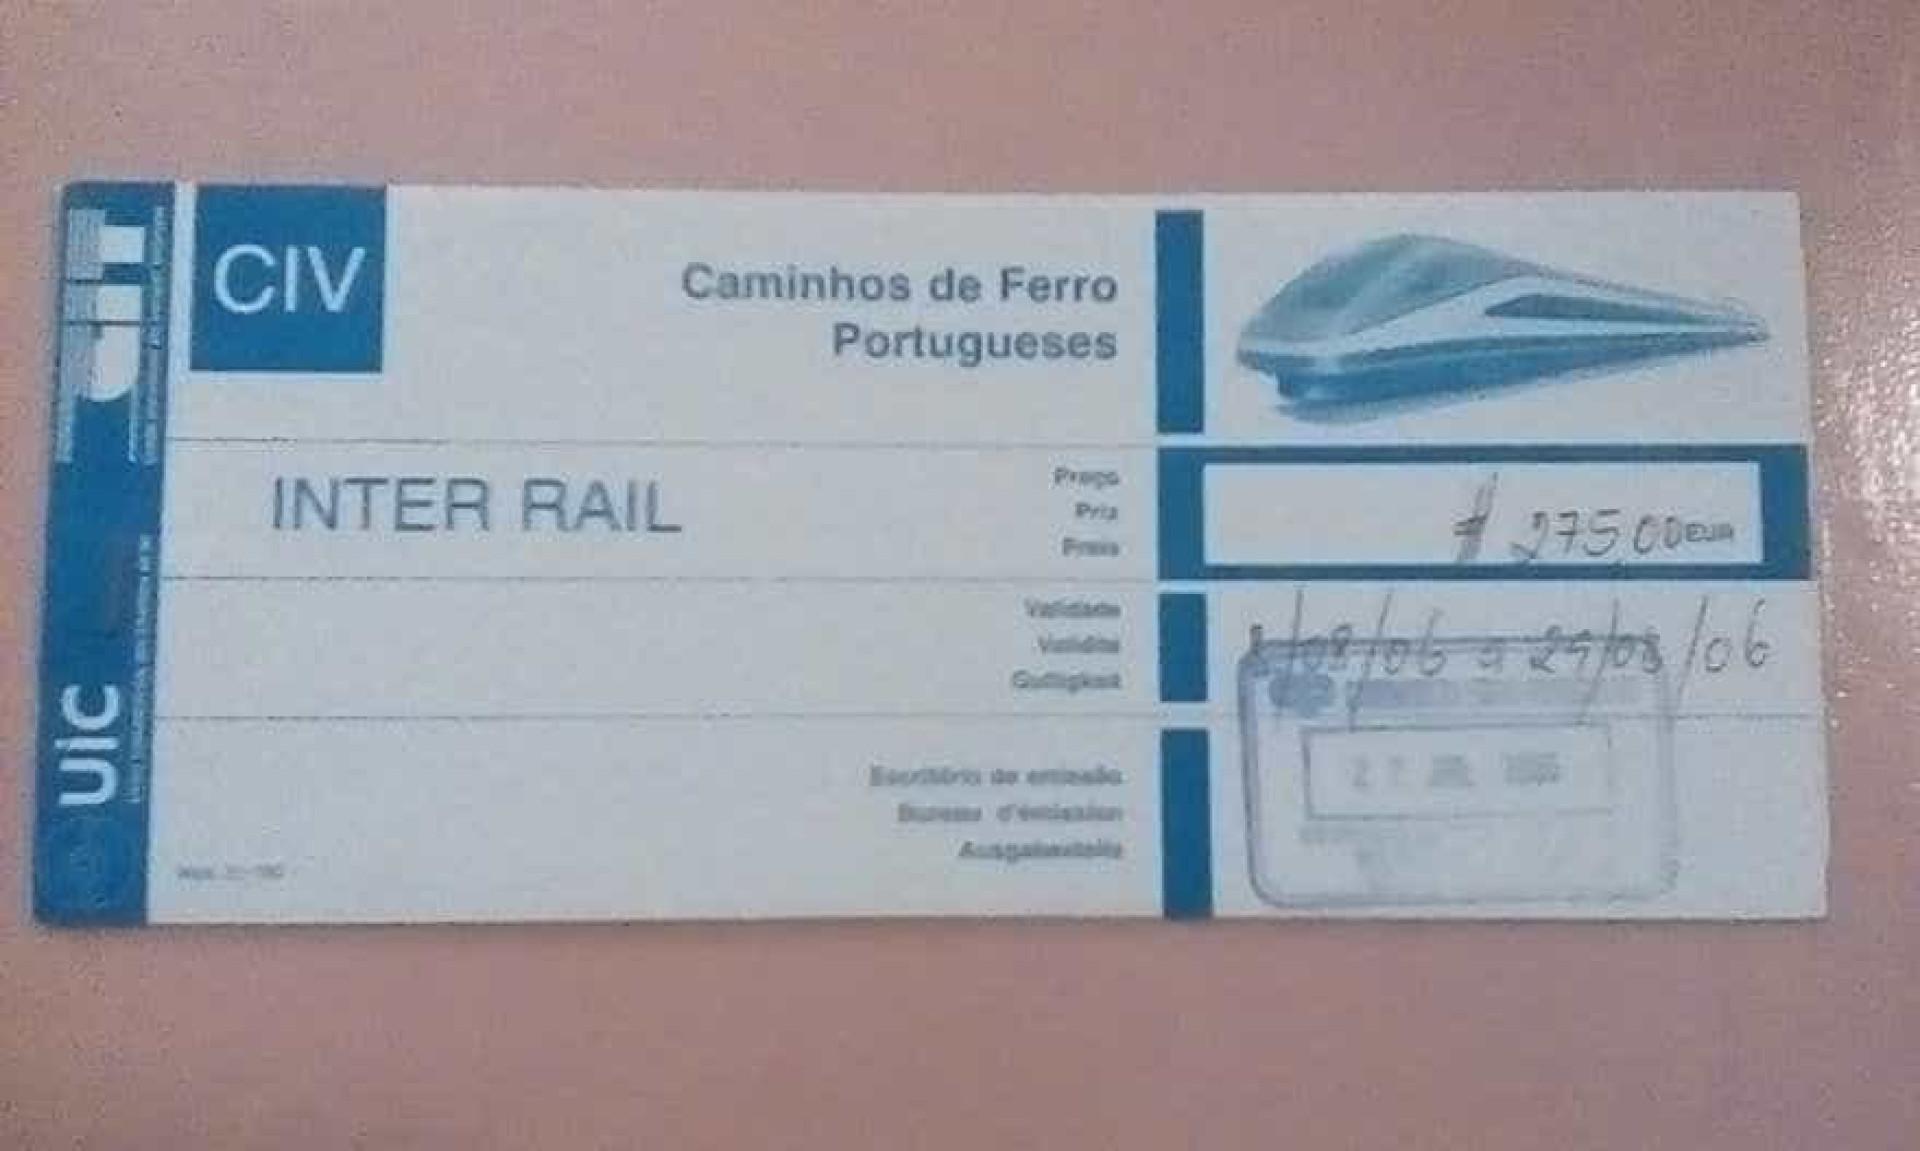 Interrail: A grande aventura continua 45 anos depois